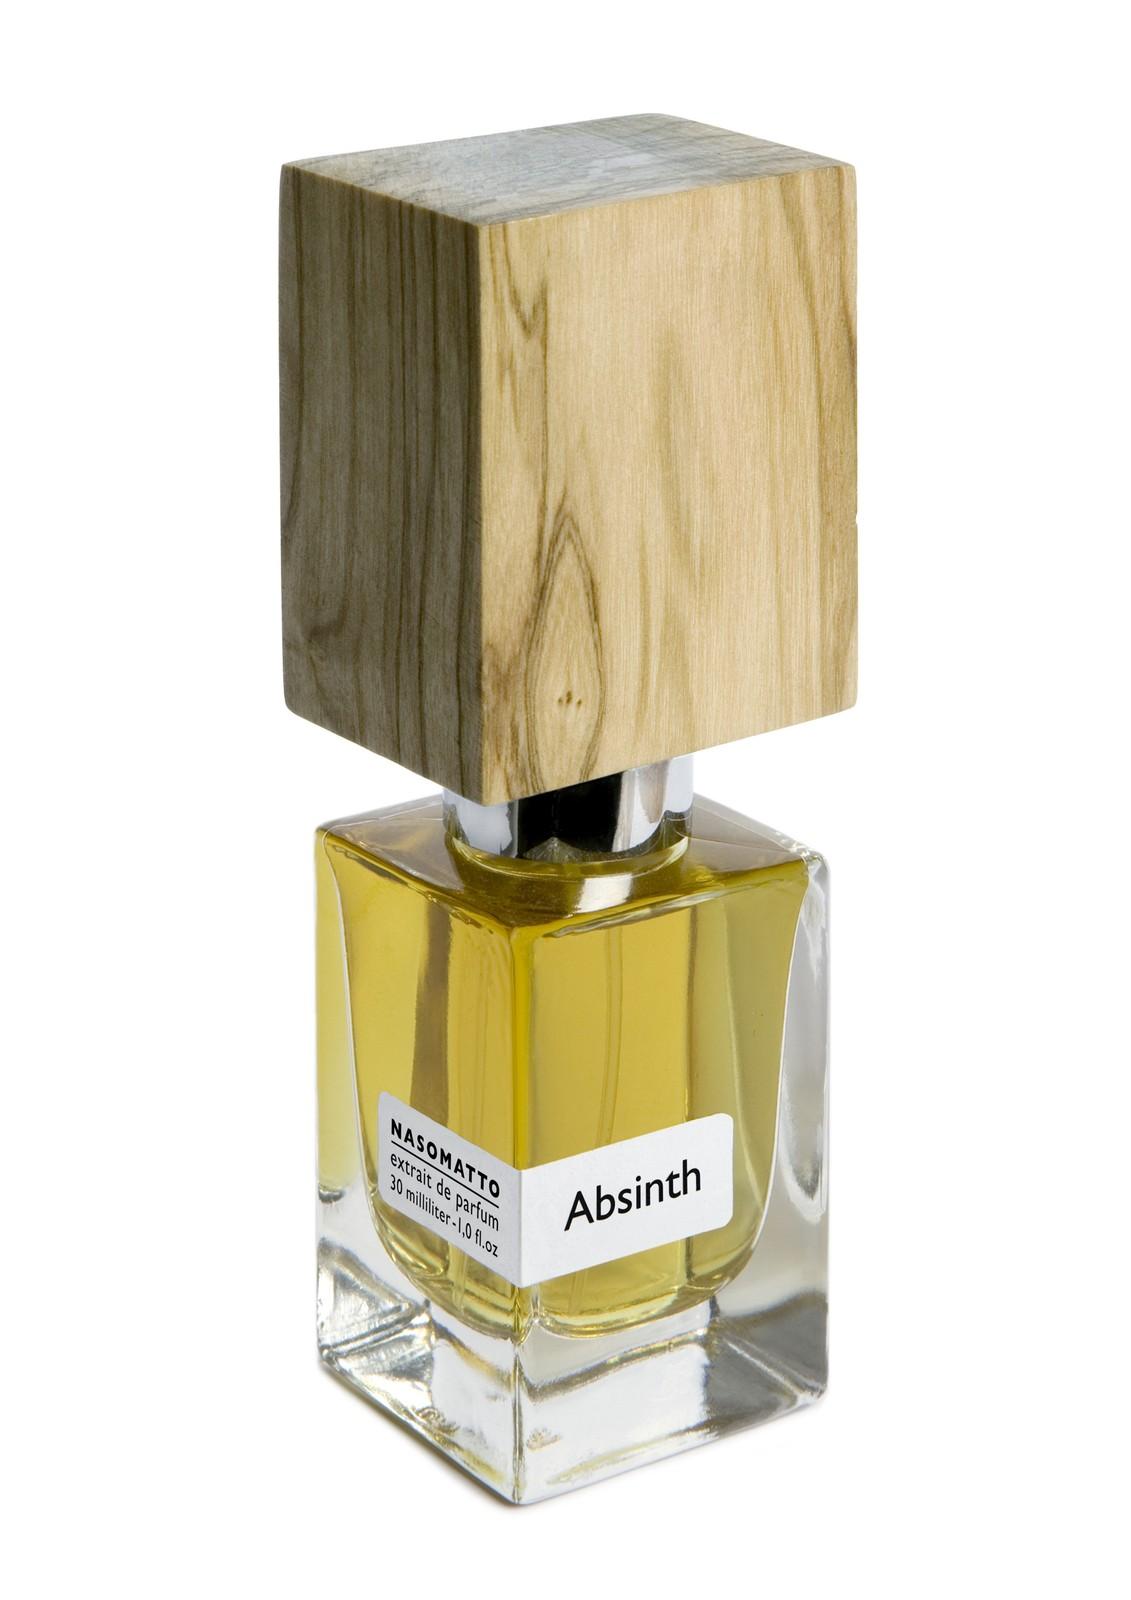 ABSINTH by NASOMATTO 5ml Travel Spray Perfume VETIVER WORMWOOD GRASS